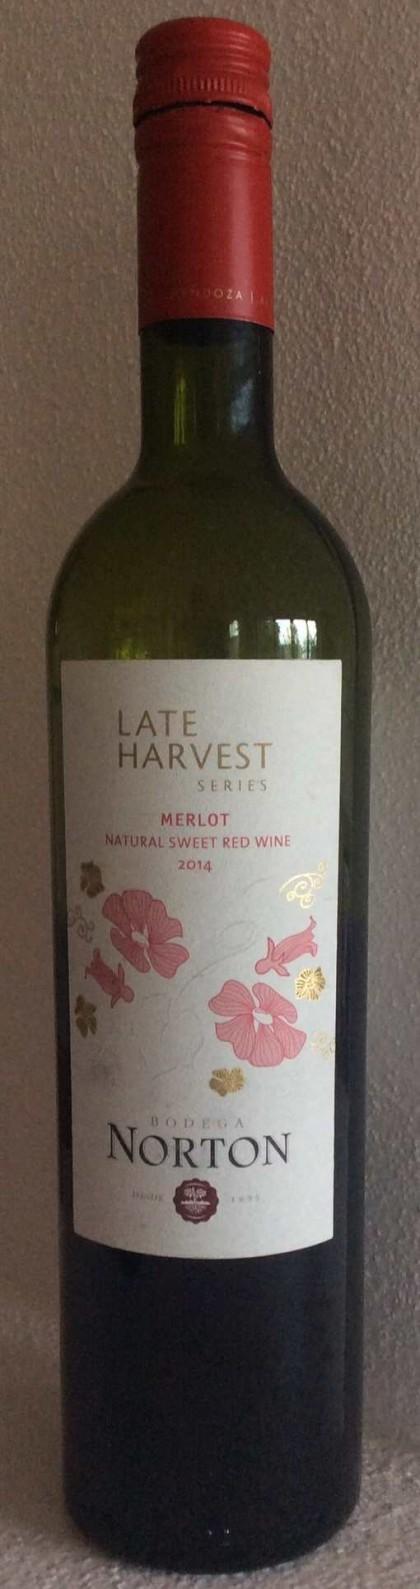 Late Harvest Sweet Merlot Norton